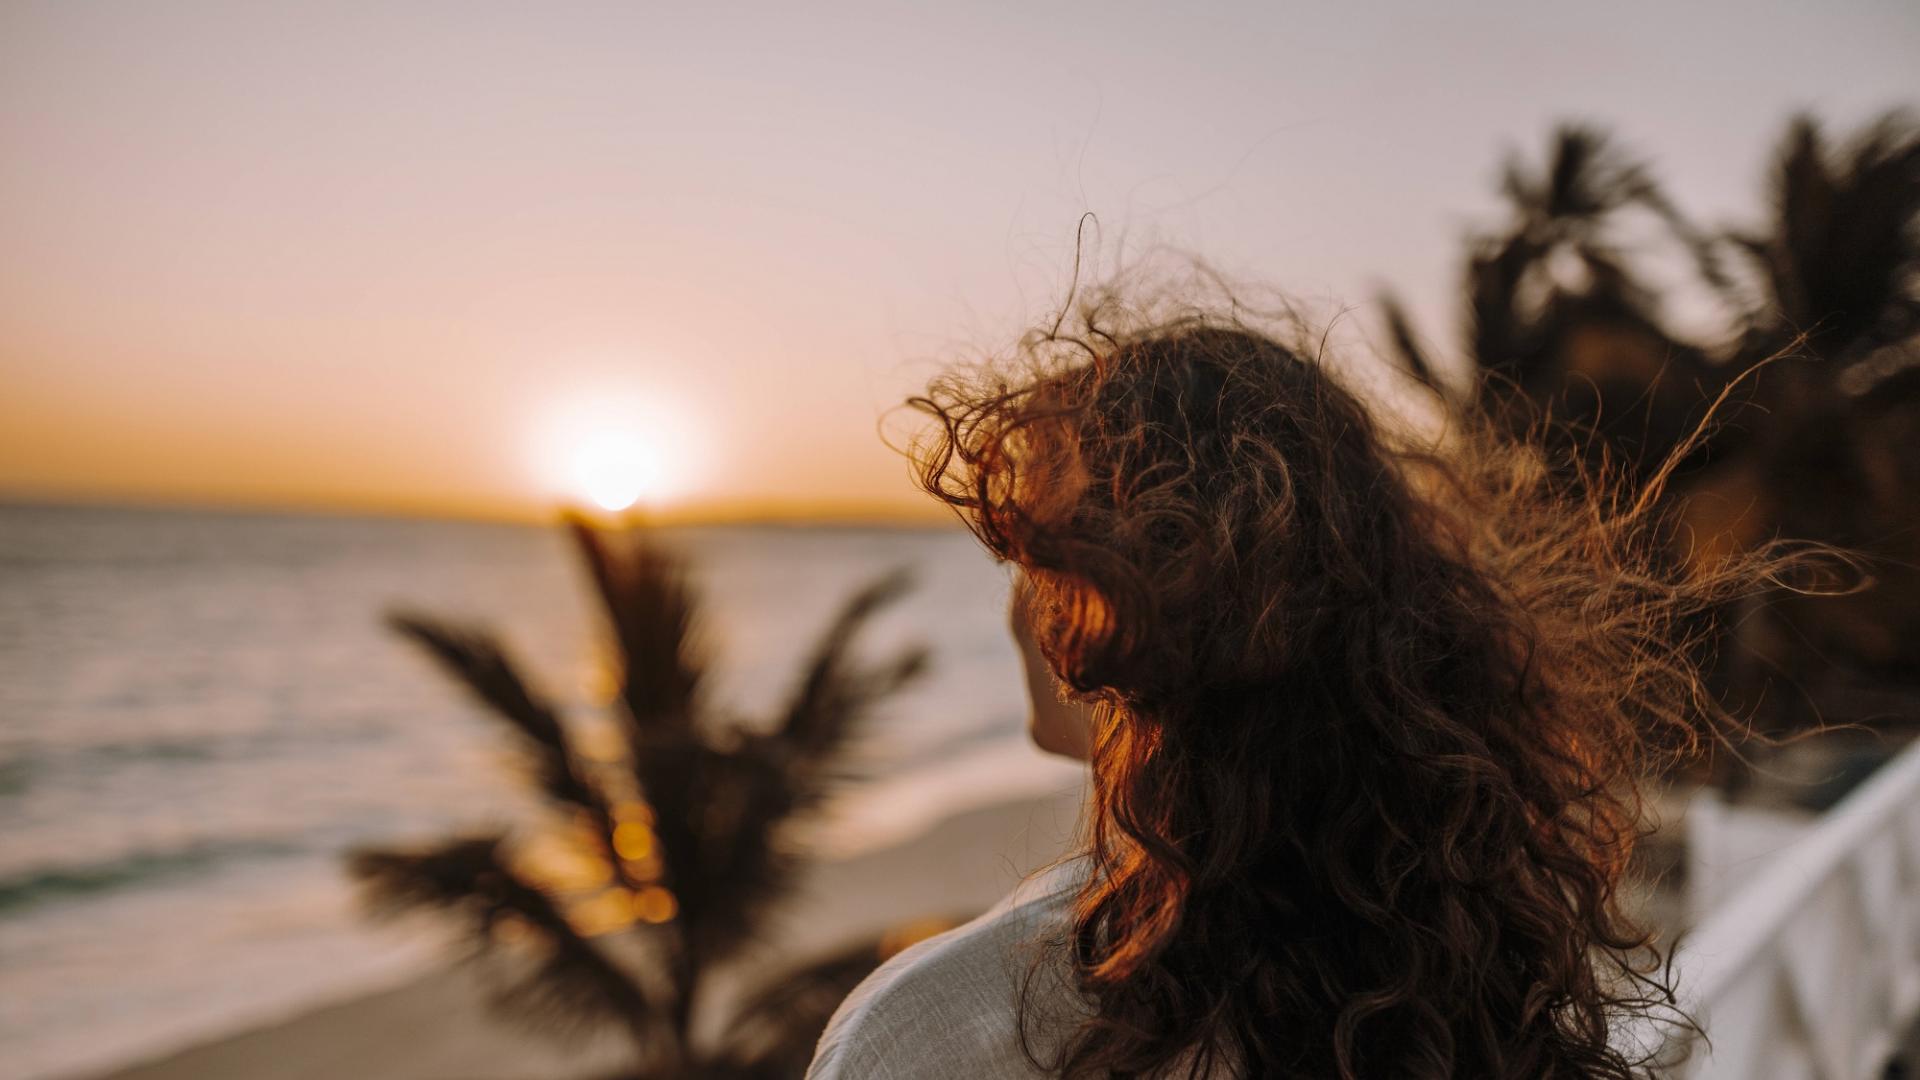 Essstörungen, Selbstzweifel, Frau, Sonnenuntergang